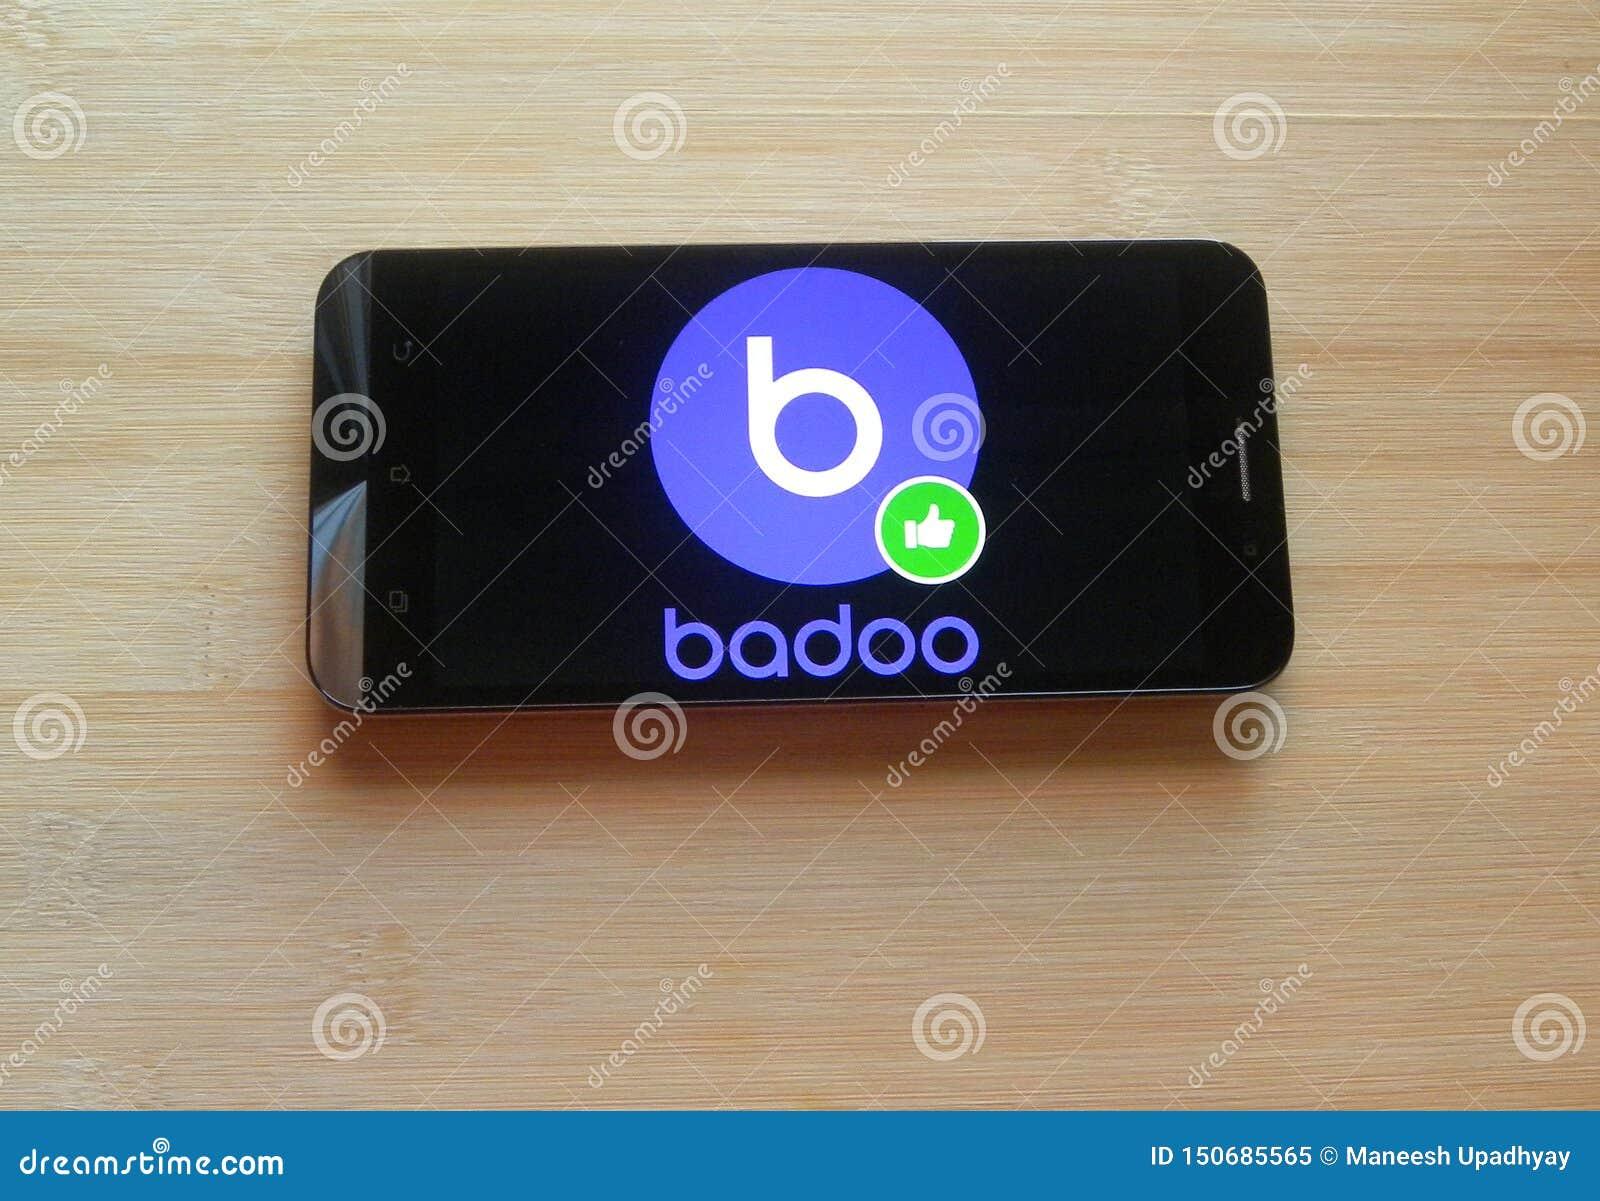 Badoo sign in francais